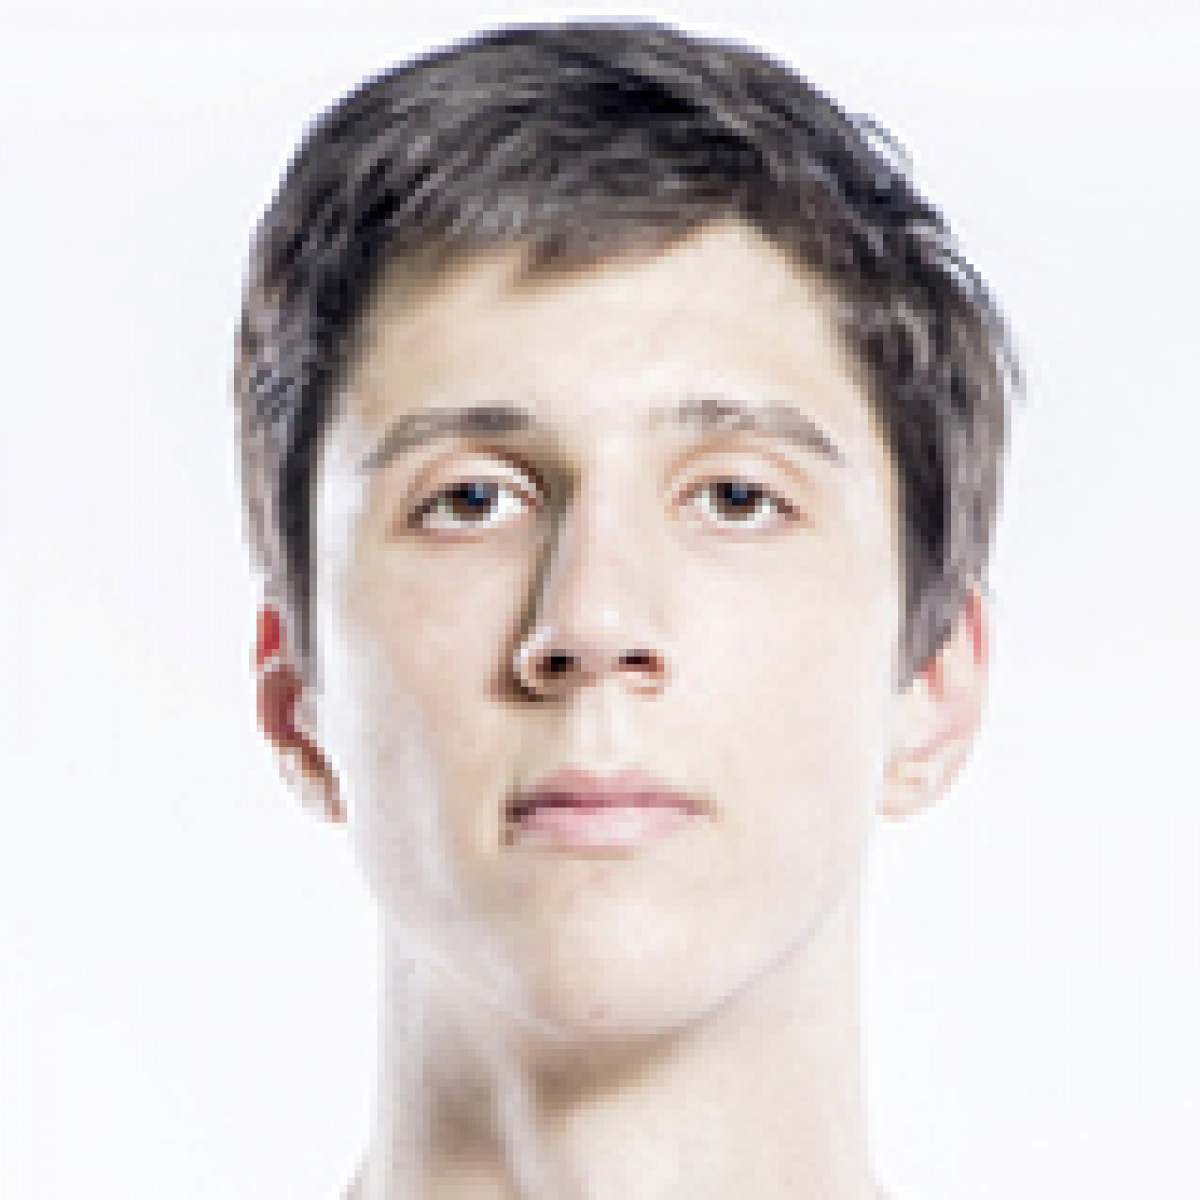 Filipp Gafurov